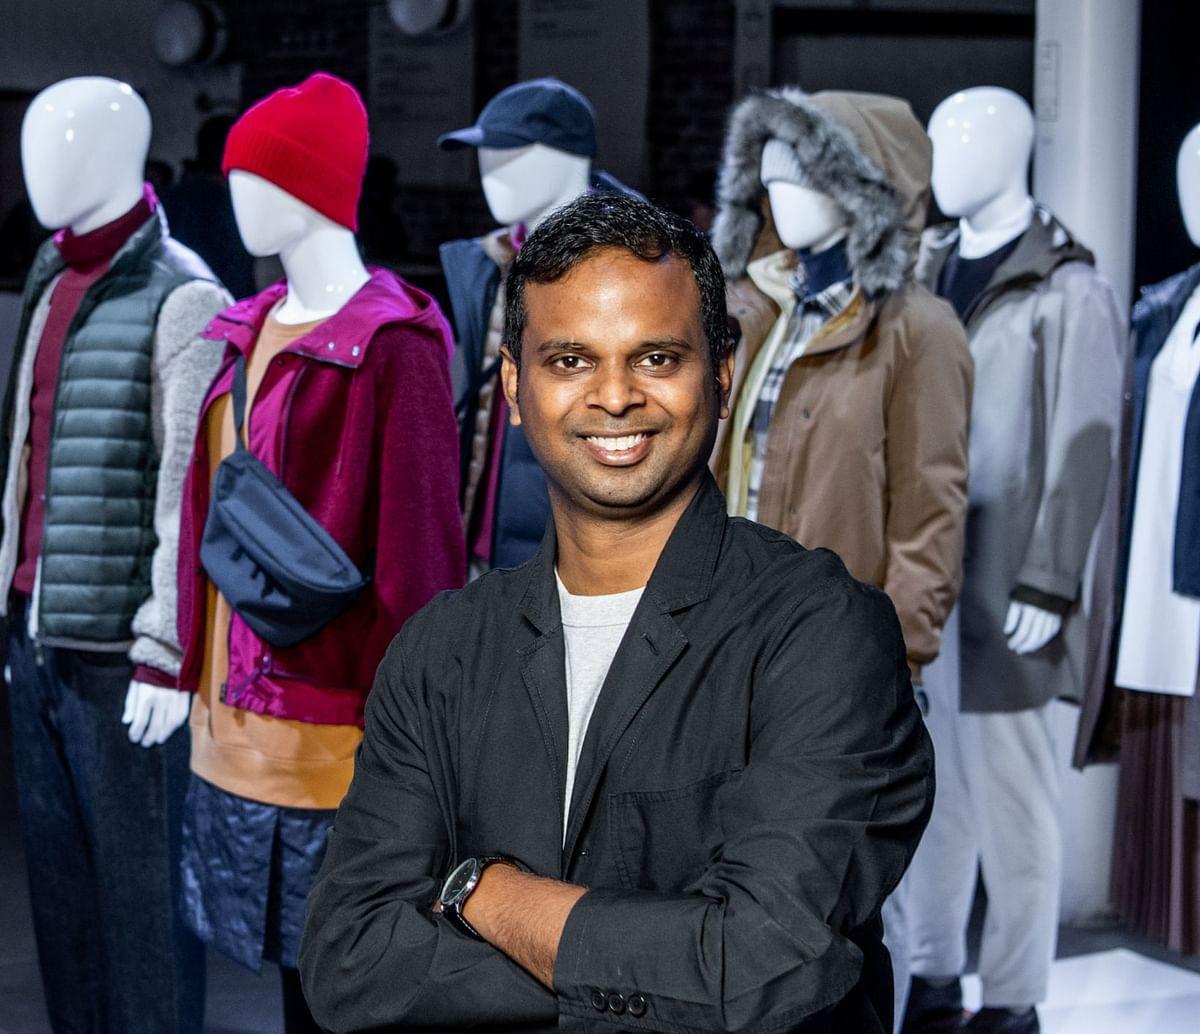 Shantanu, head of marketing, Uniqlo